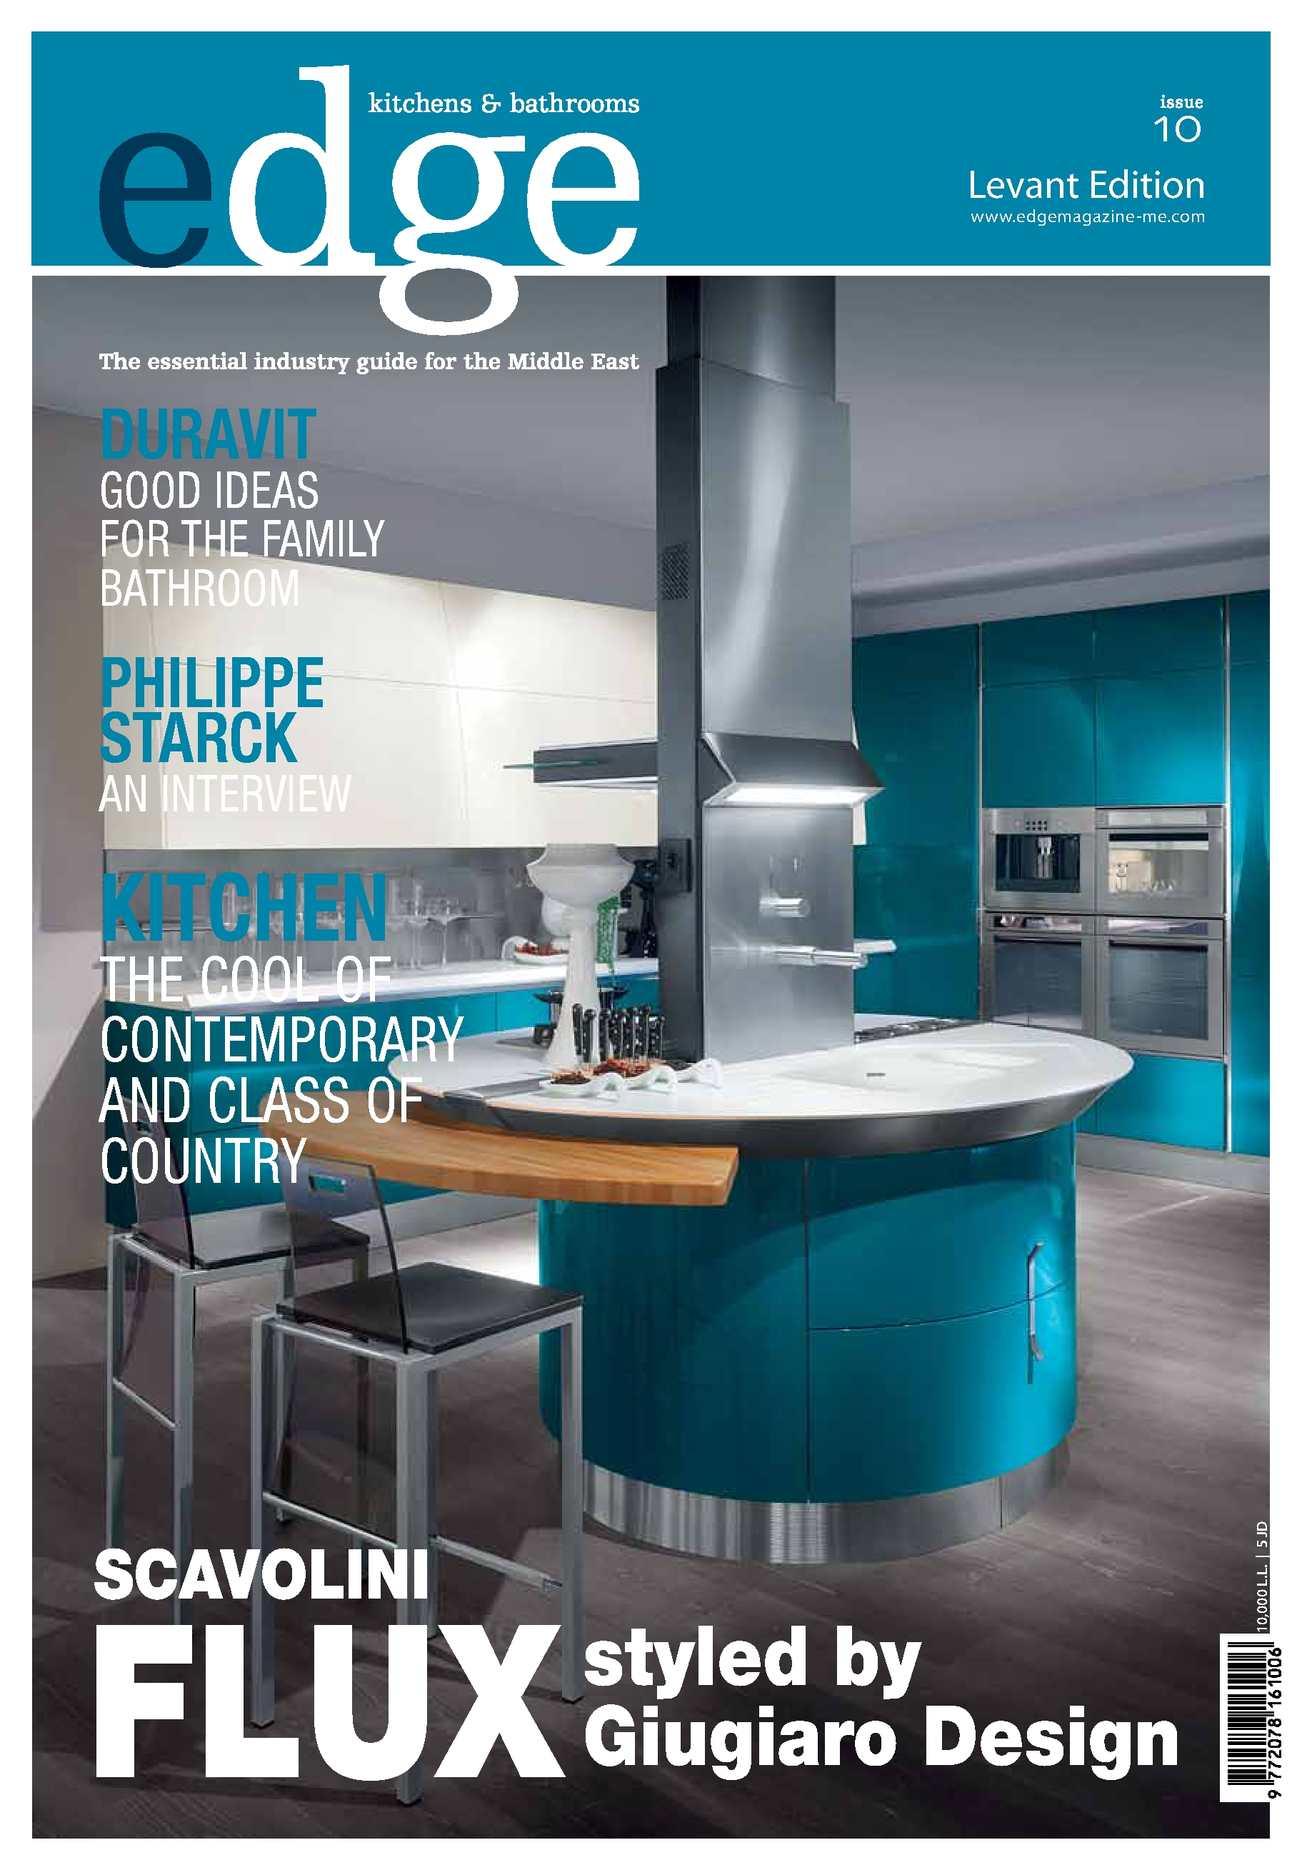 Calaméo - EDGE Kitchens & Bathrooms Magazine Levant Issue 10